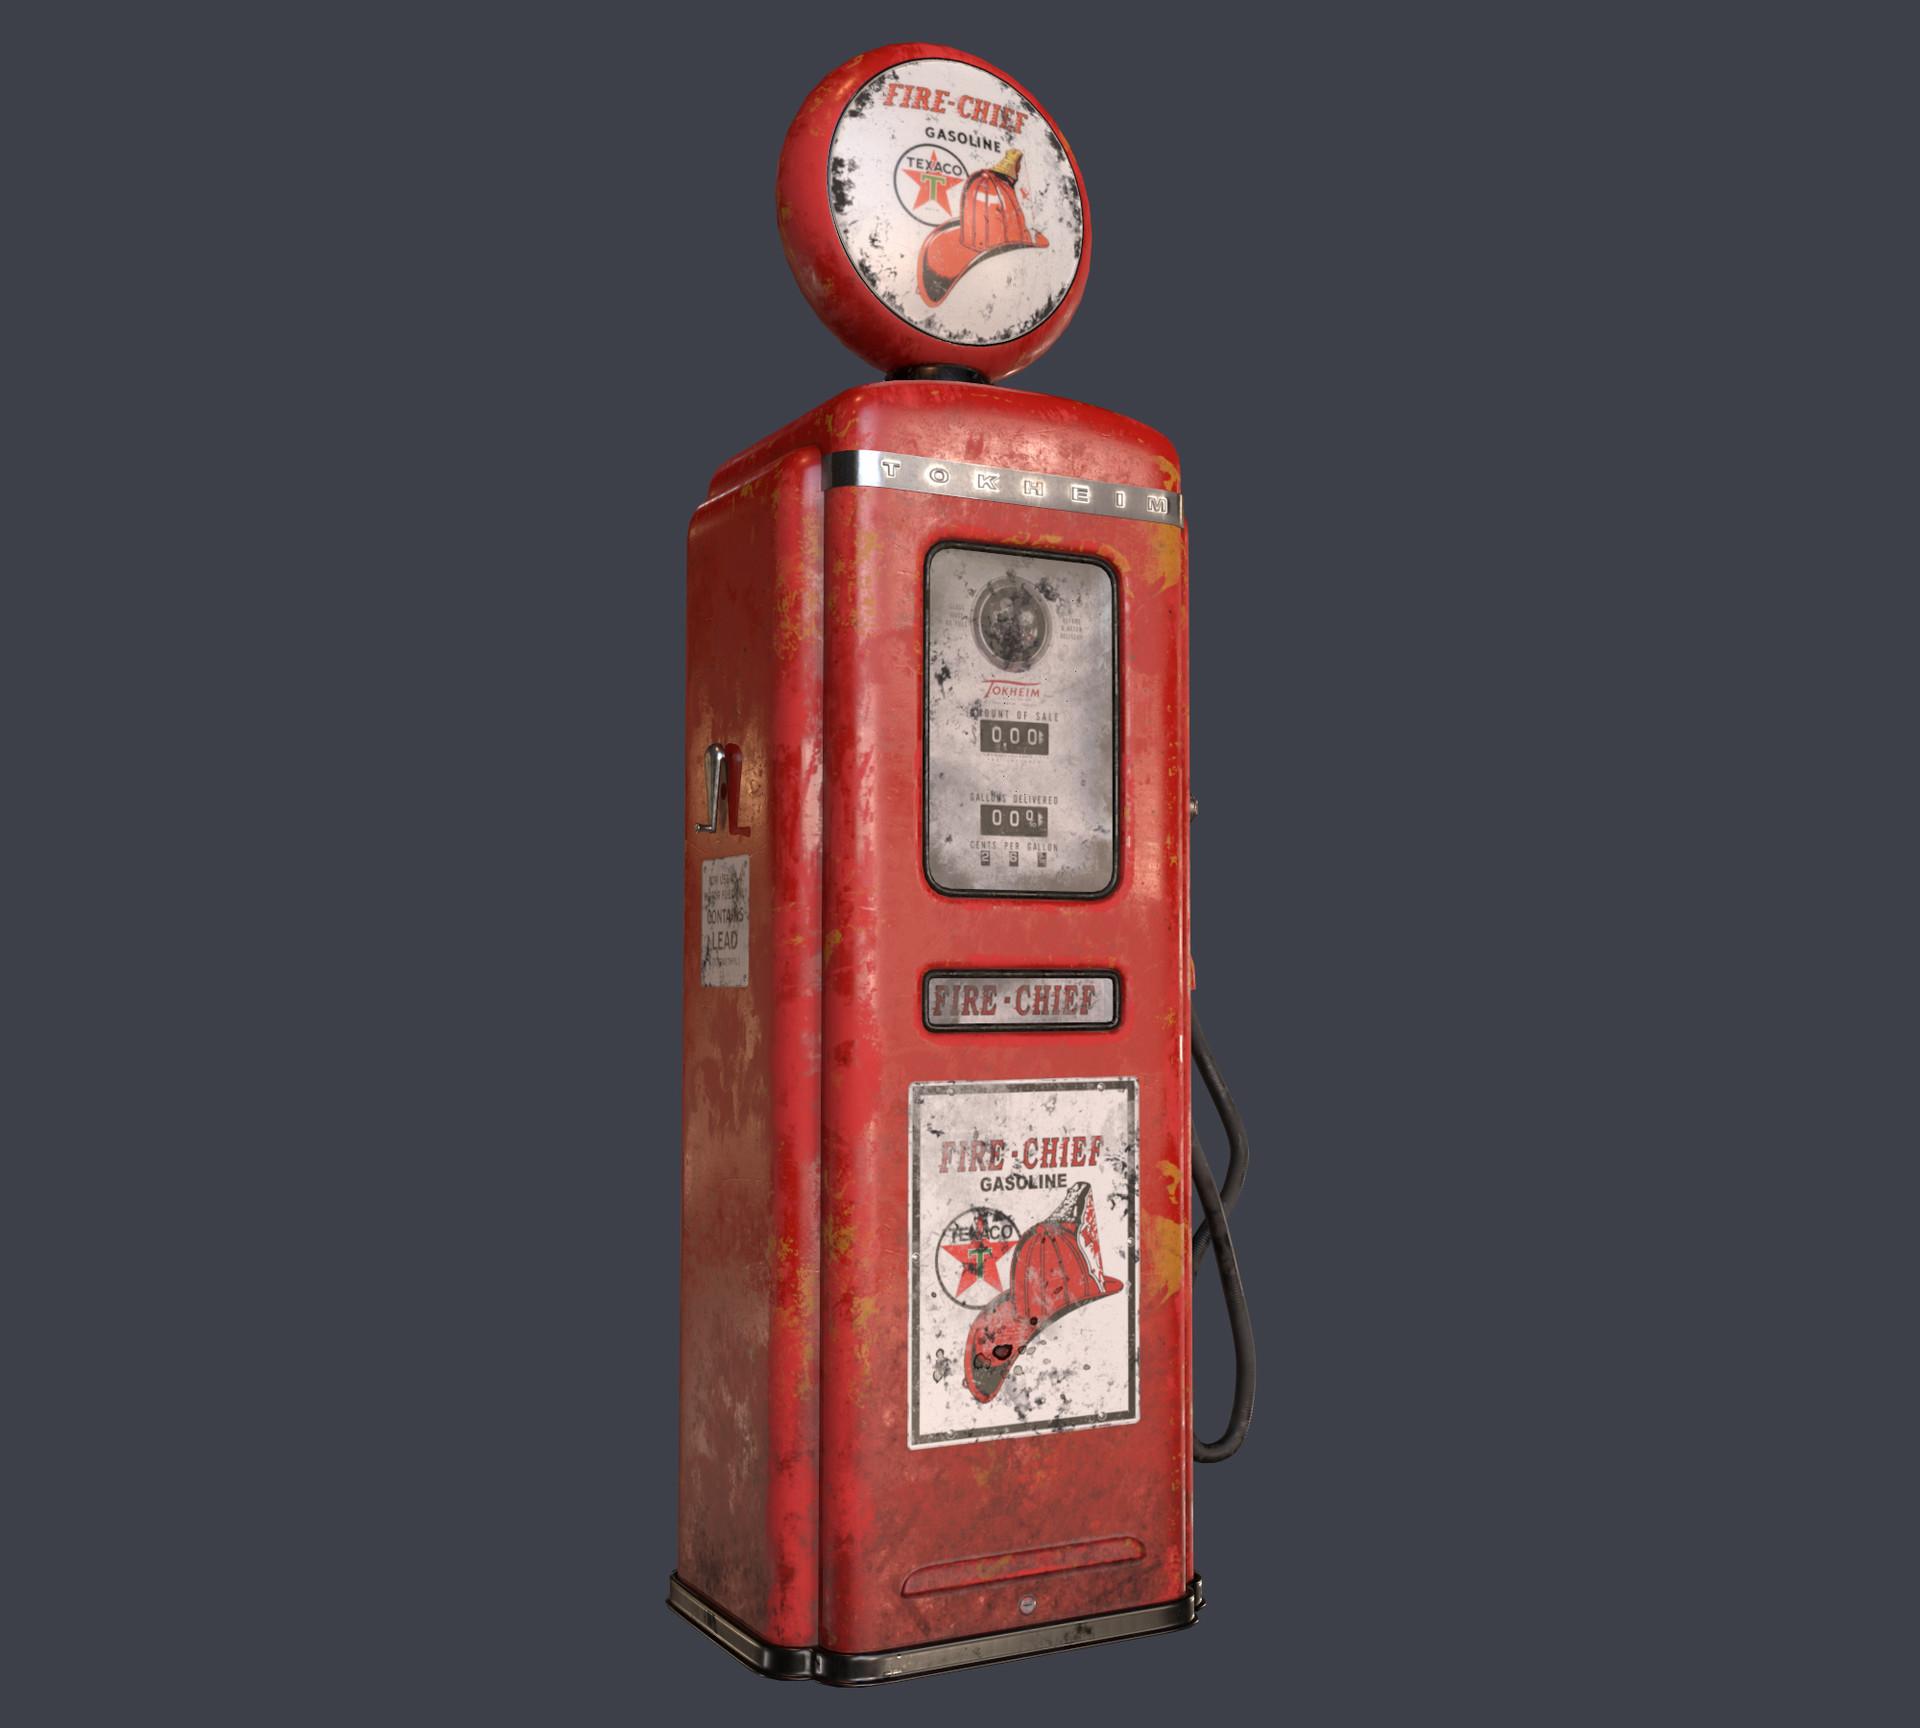 ArtStation - Old Gas Pump, Anton Kazmin